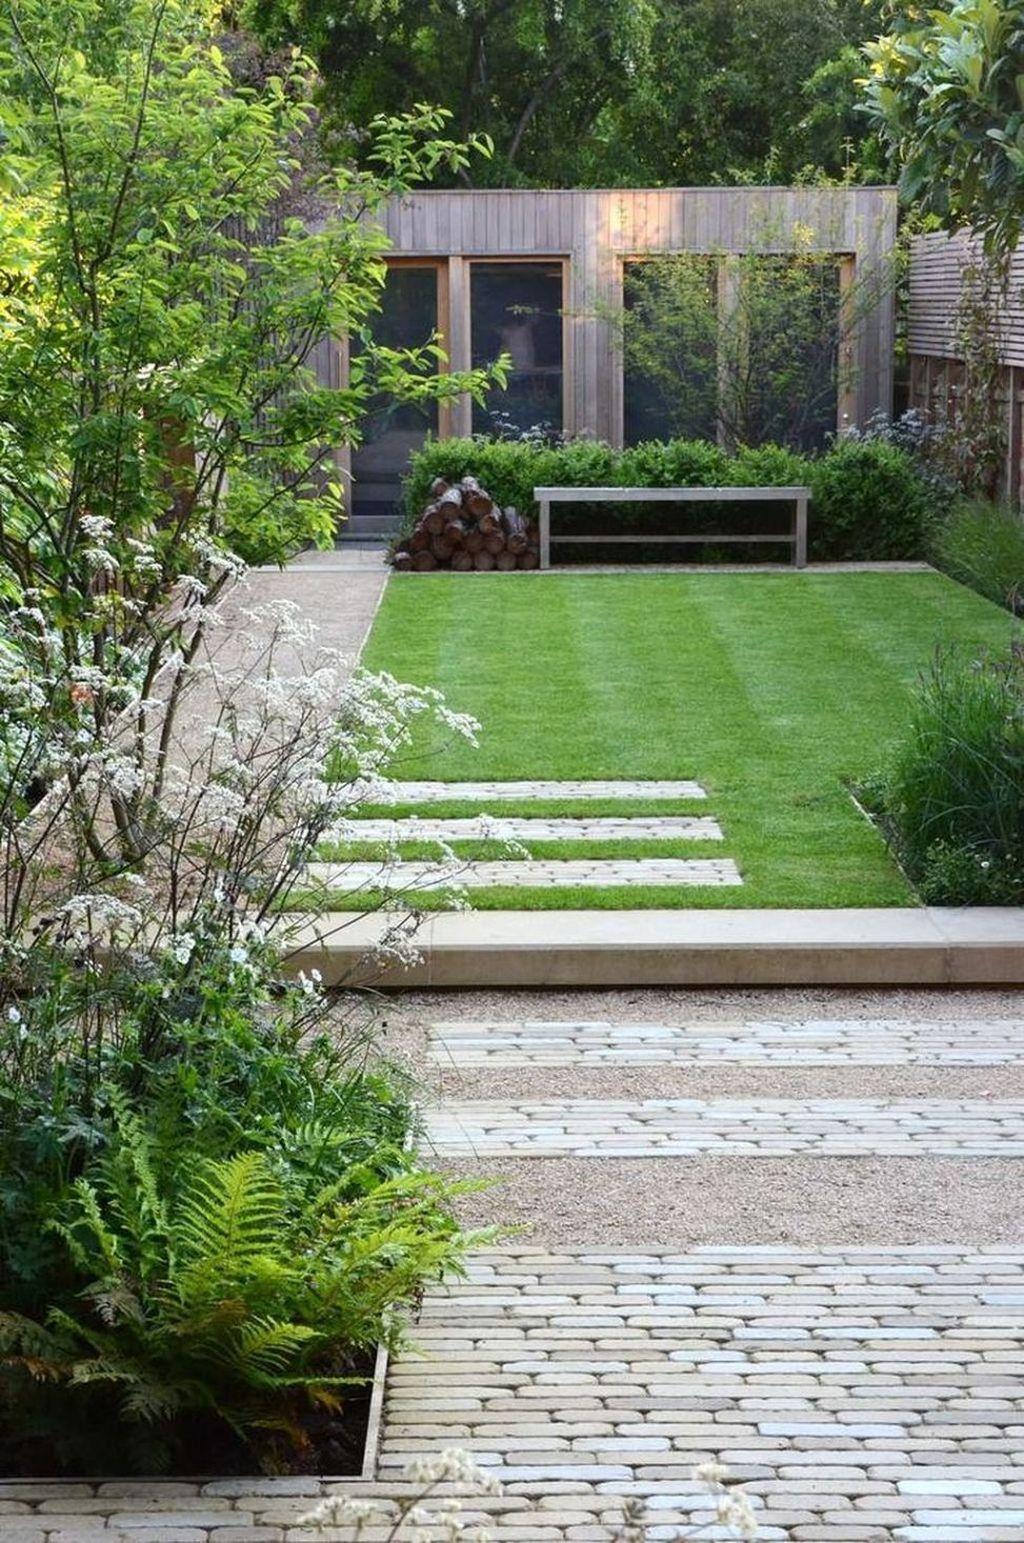 The Best Urban Garden Design Ideas For Your Backyard 33